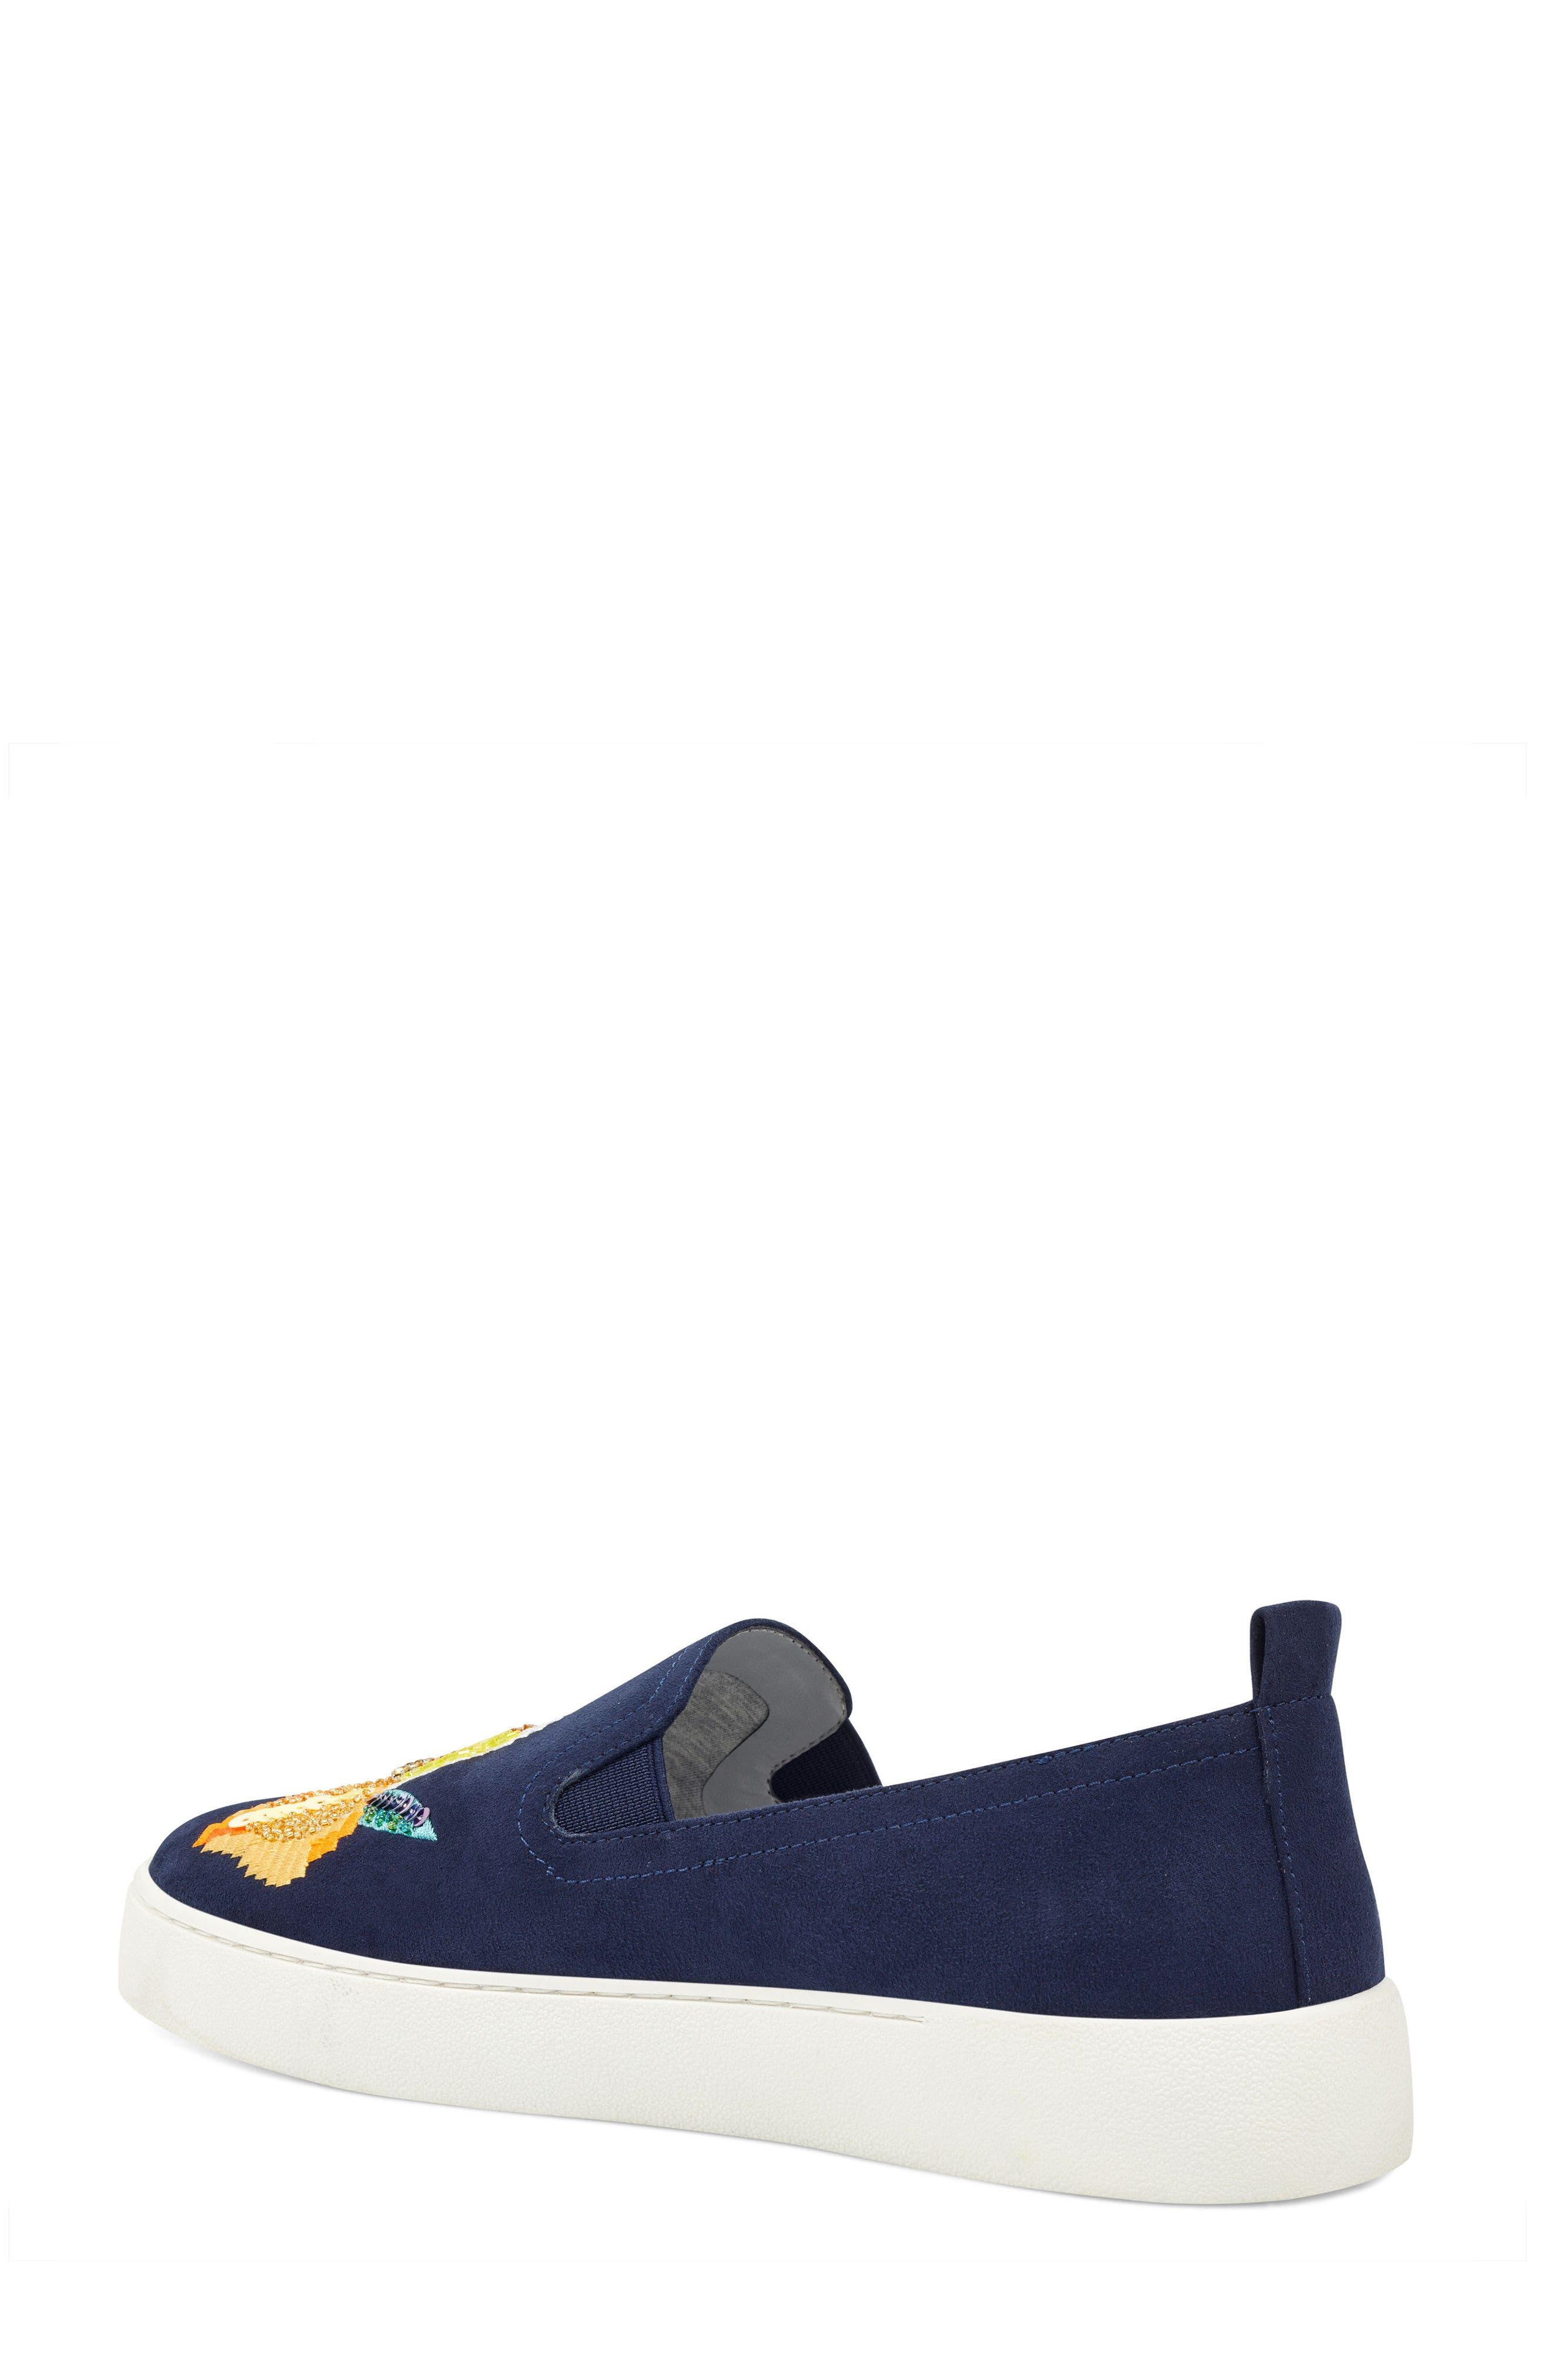 Playavista Slip-On Sneaker,                             Alternate thumbnail 2, color,                             Navy Suede